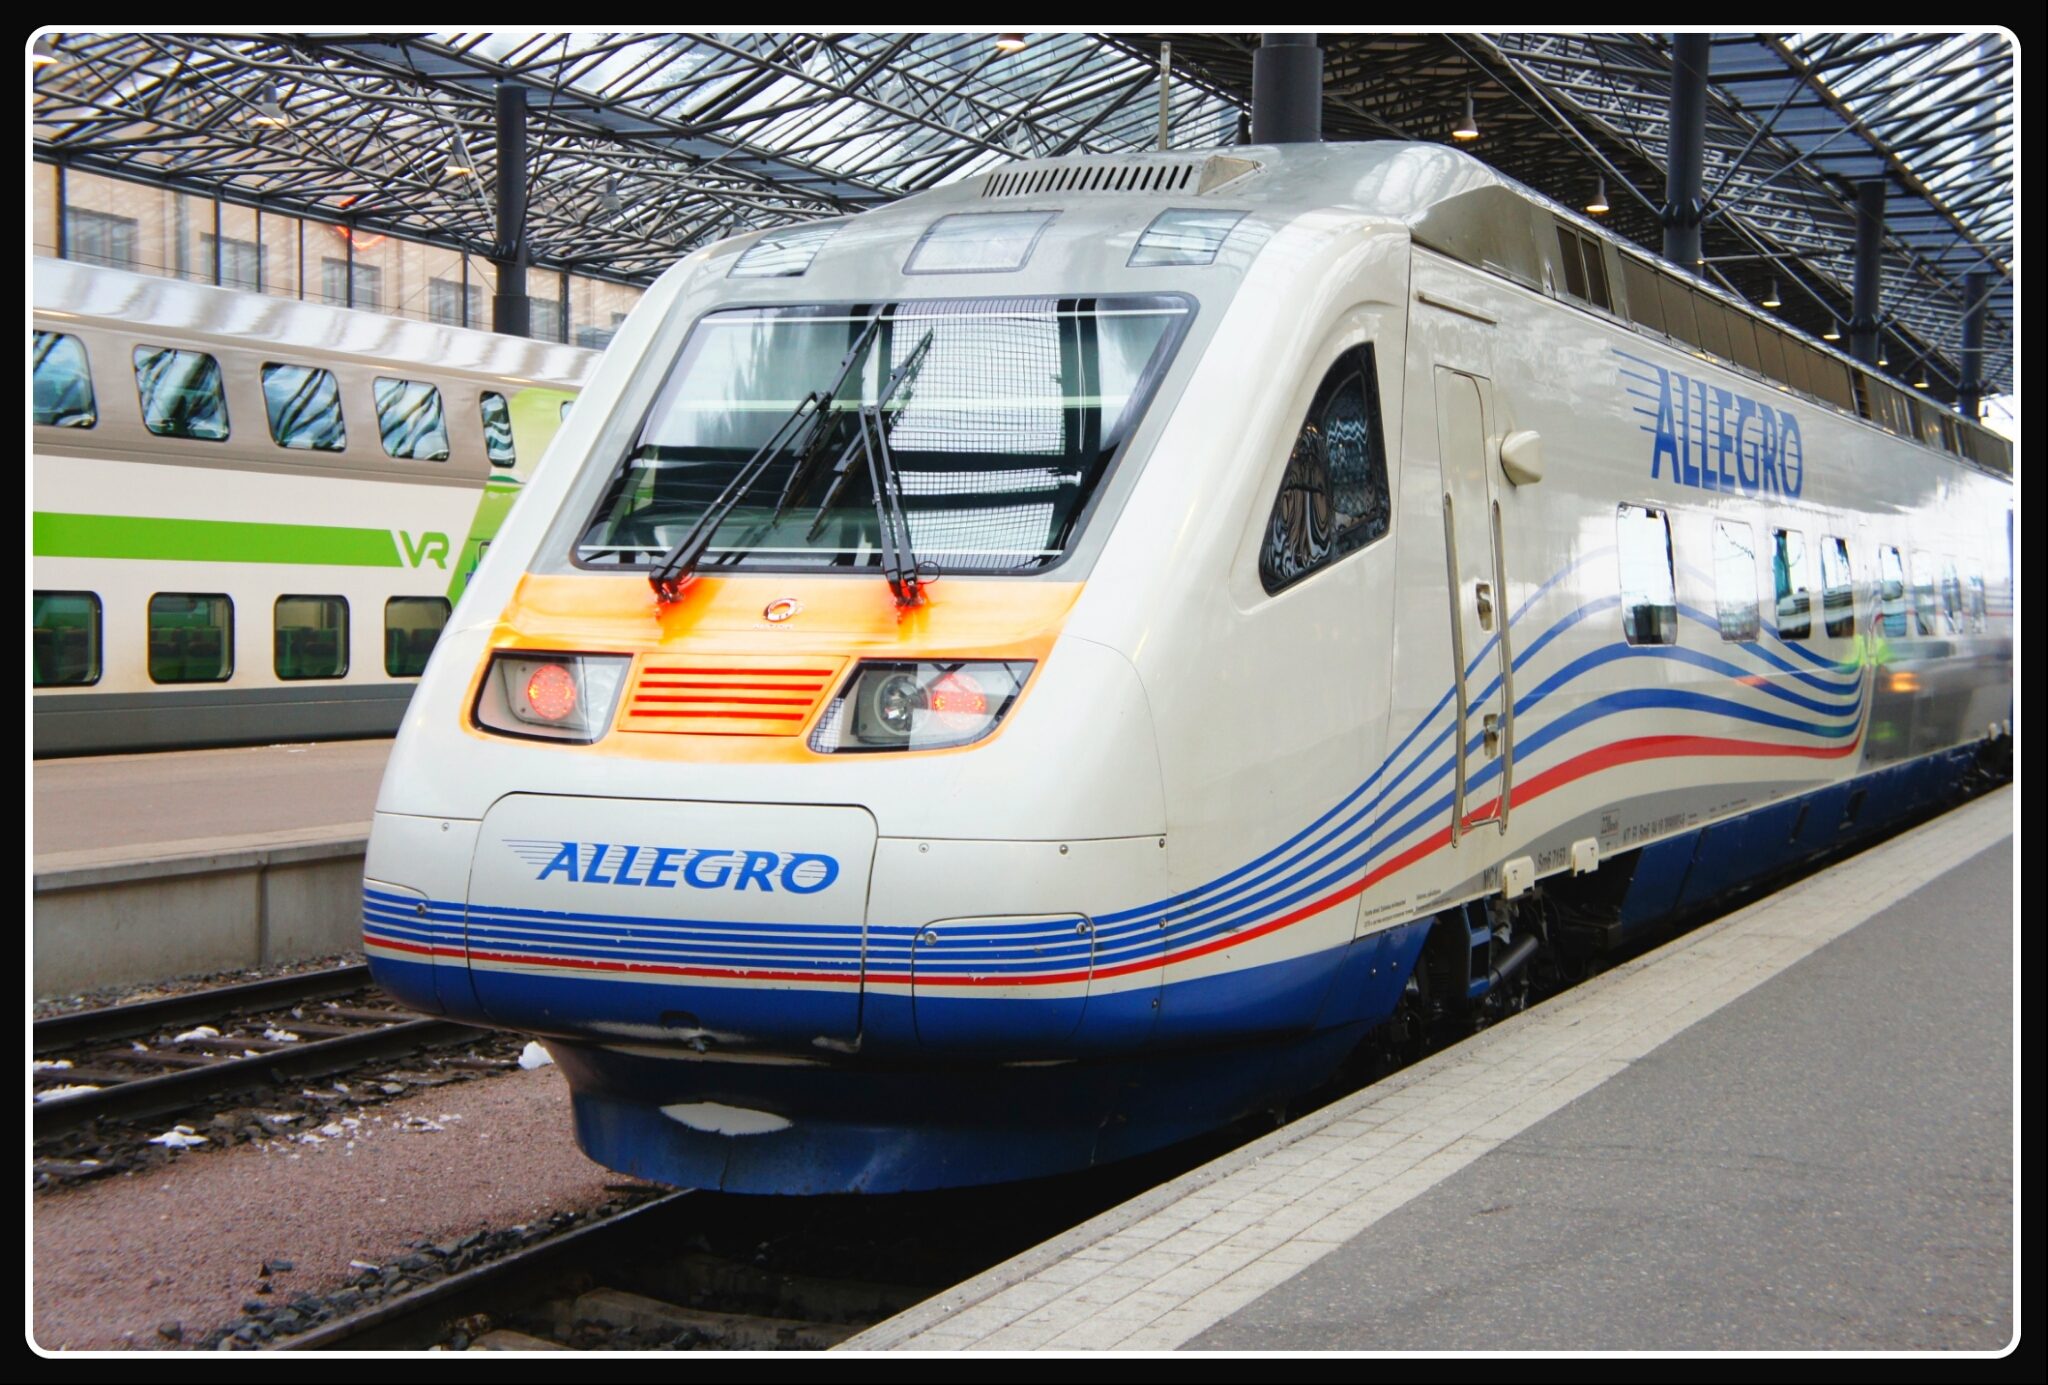 Скоростной поезд Аллегро Санкт-Петербург - Хельсинки